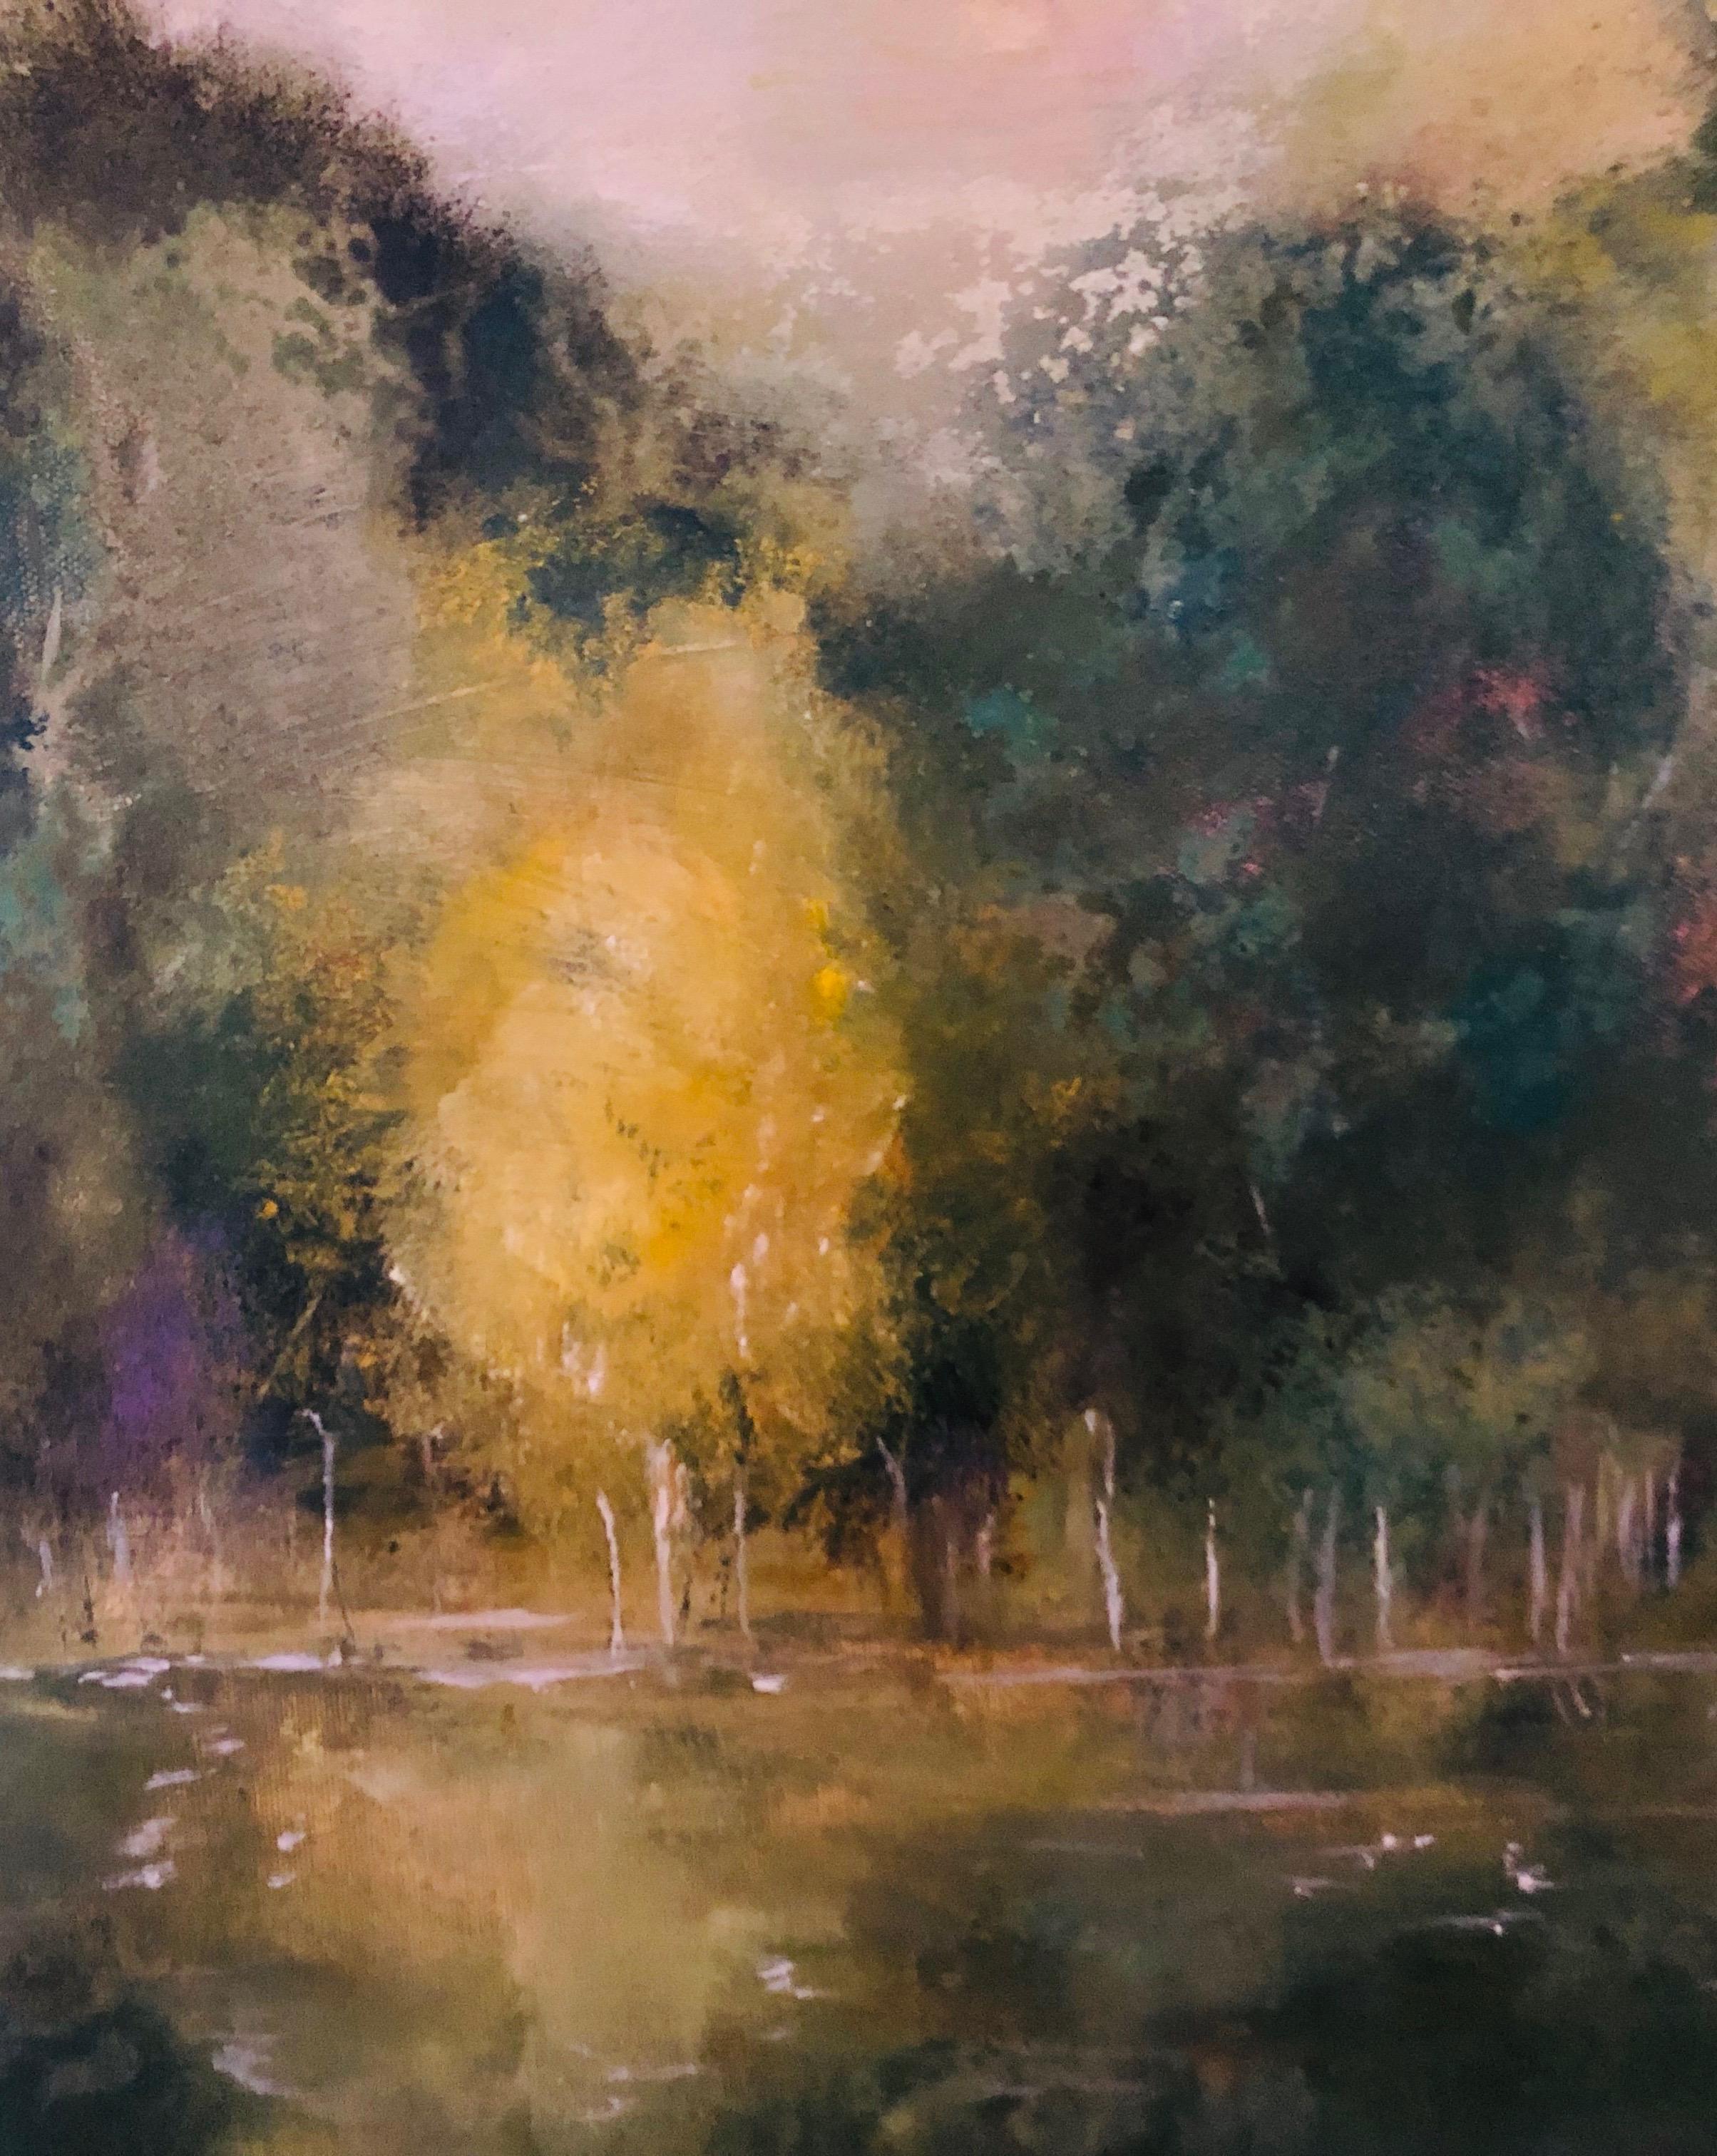 'A walk along the pond'